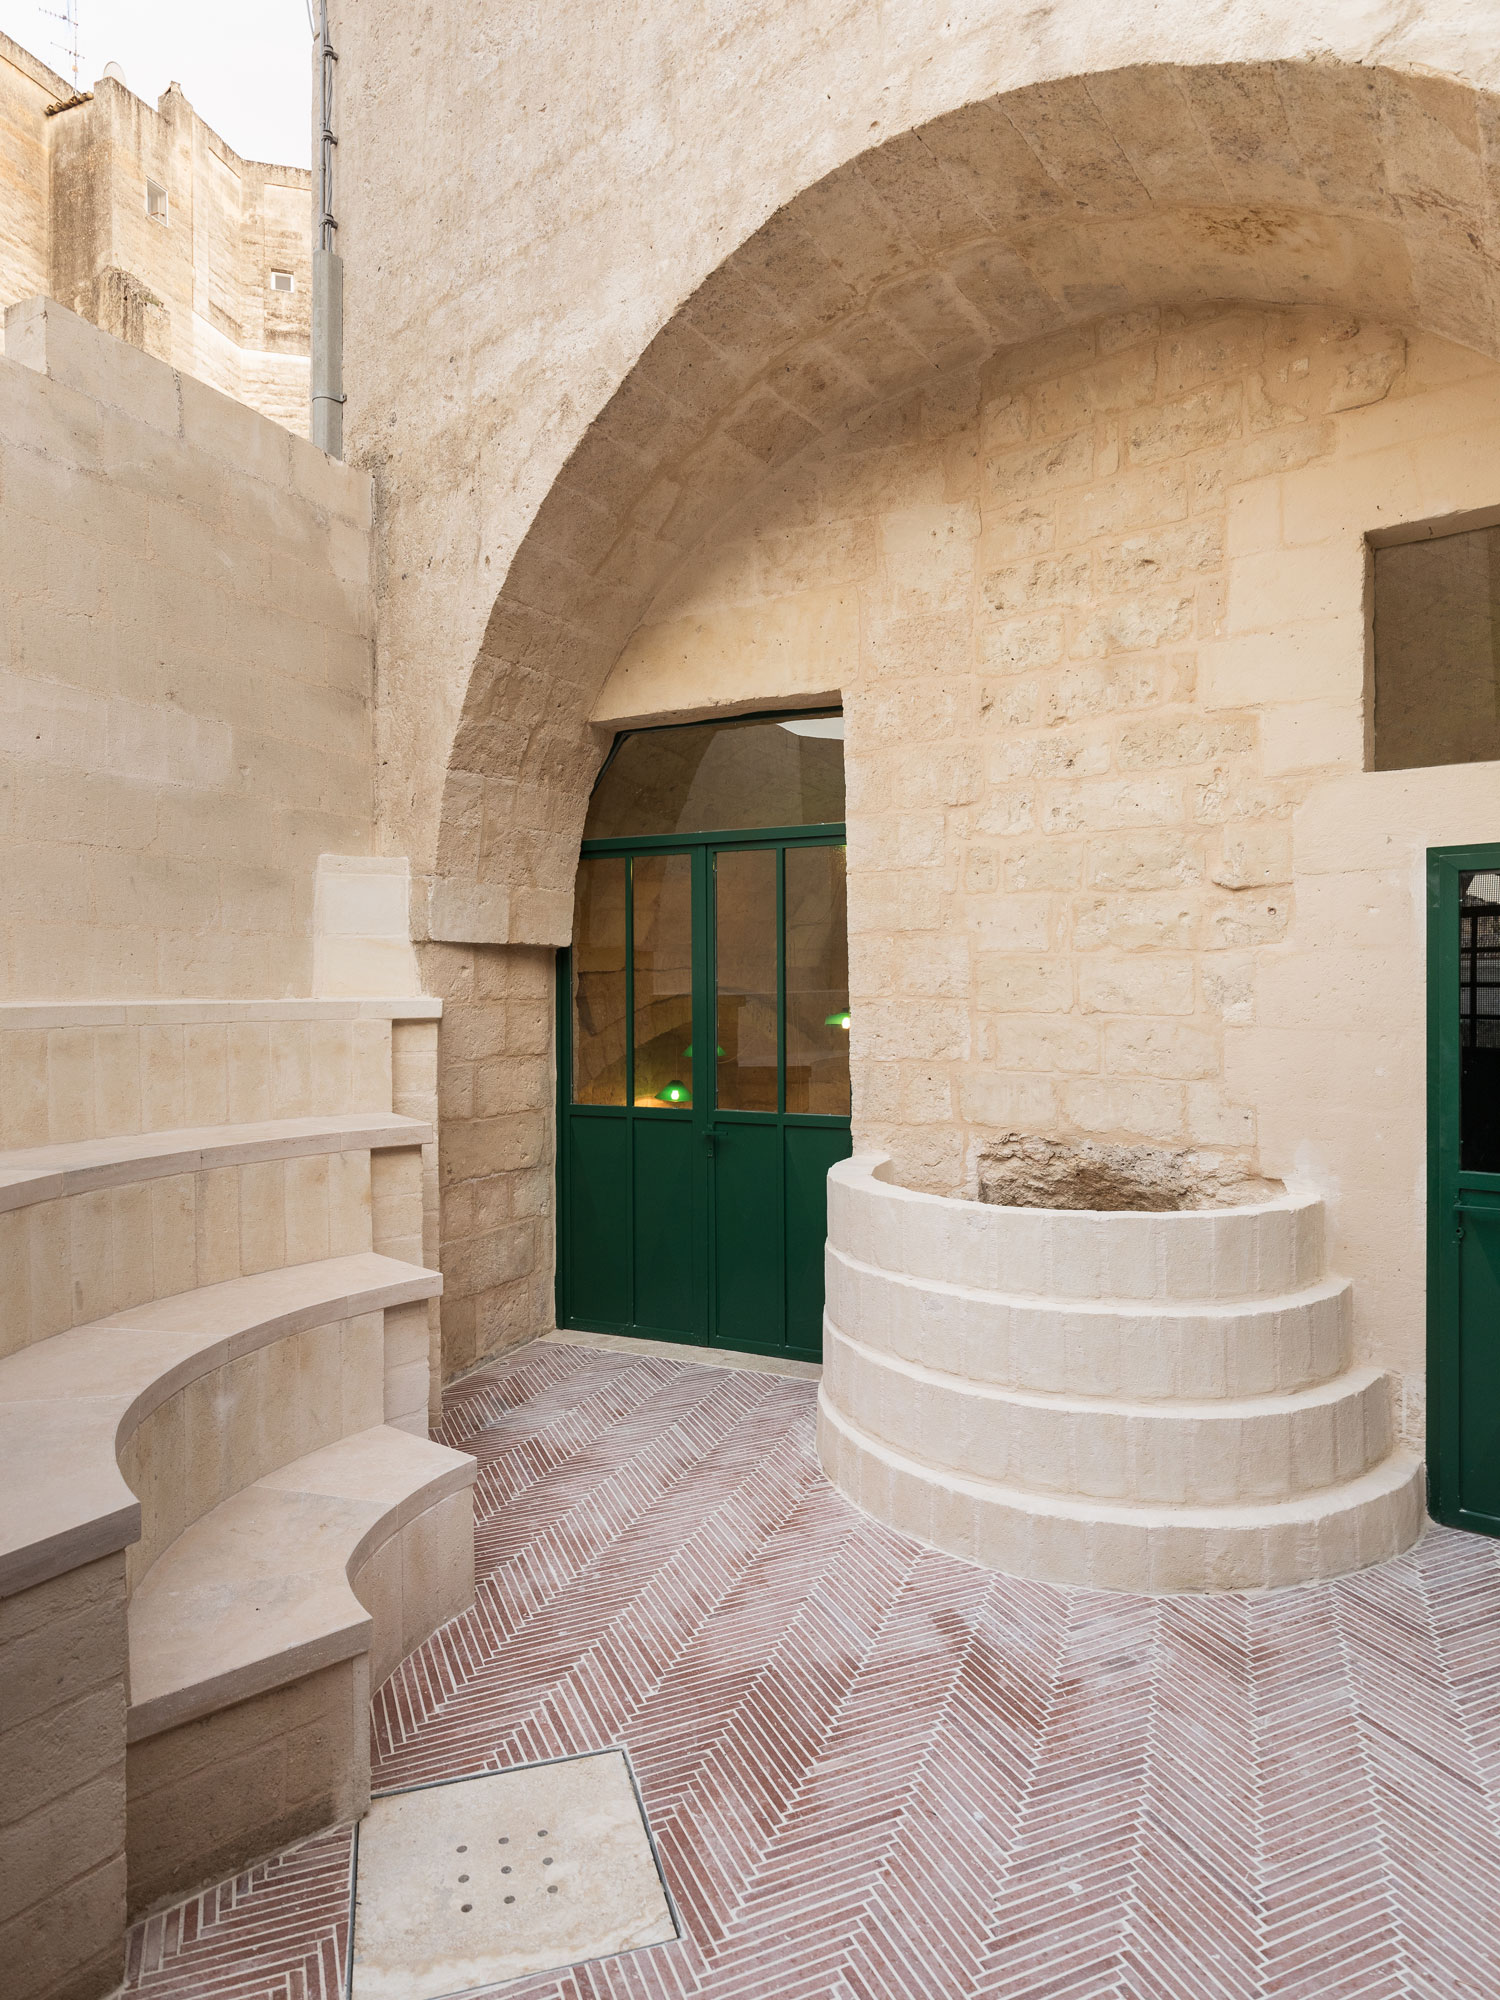 Enoteca dai Tosi: Wine Bar Carved Into a Mountain in Matera, Italy, Designed by Architecten De Vylder Vinck Taillieu   Yellowtrace